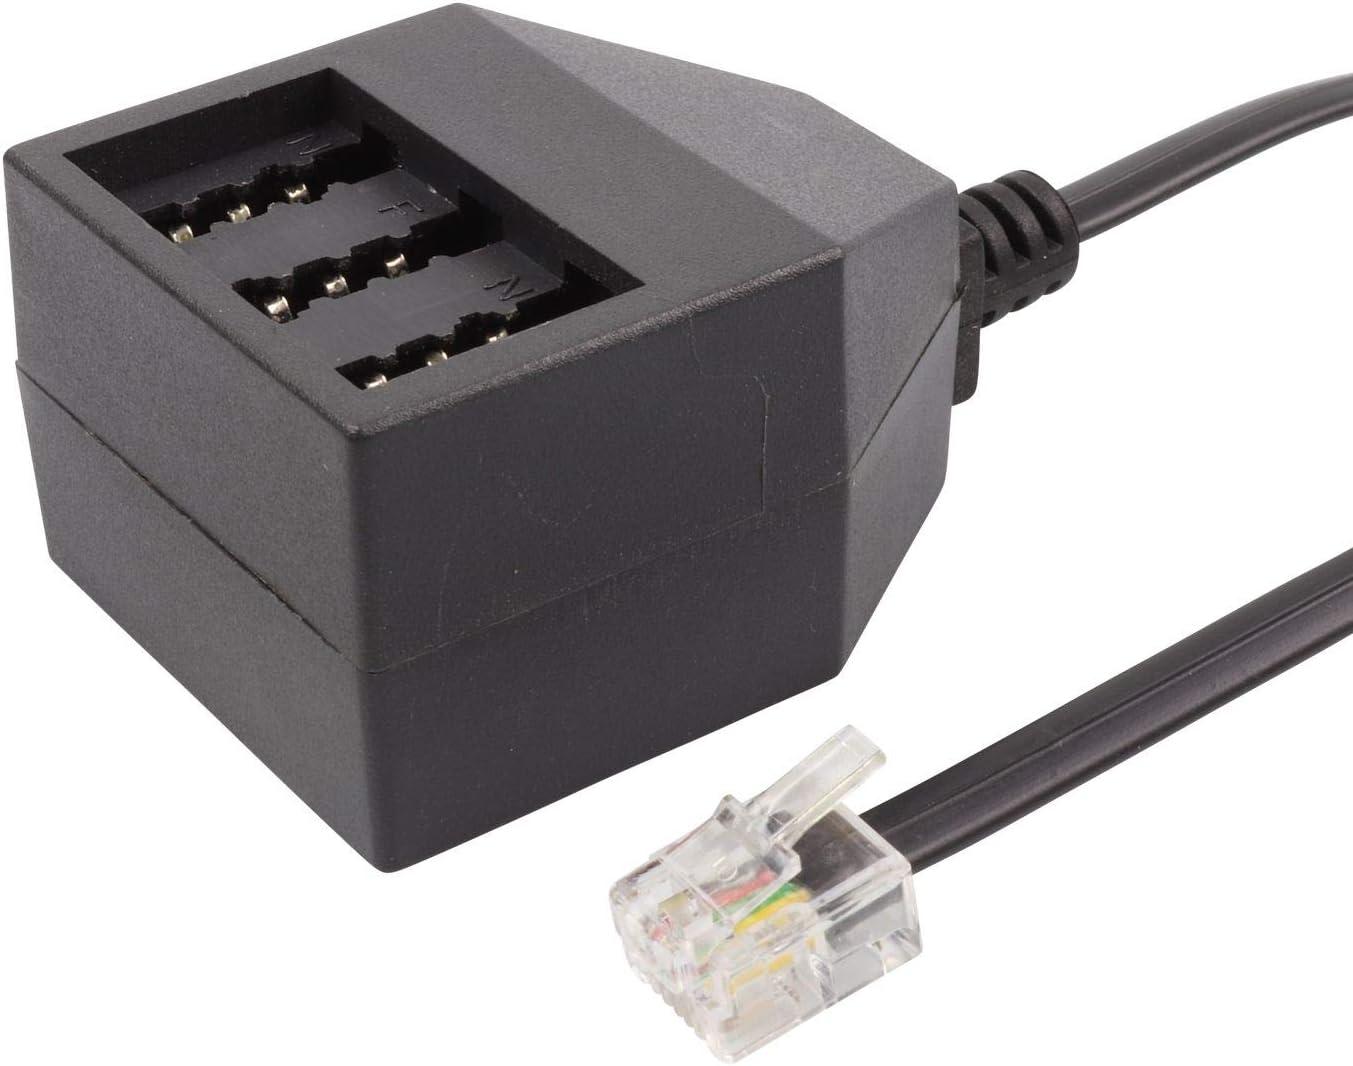 S Conn Maximum Connectivity Western Stecker 6 4 Elektronik